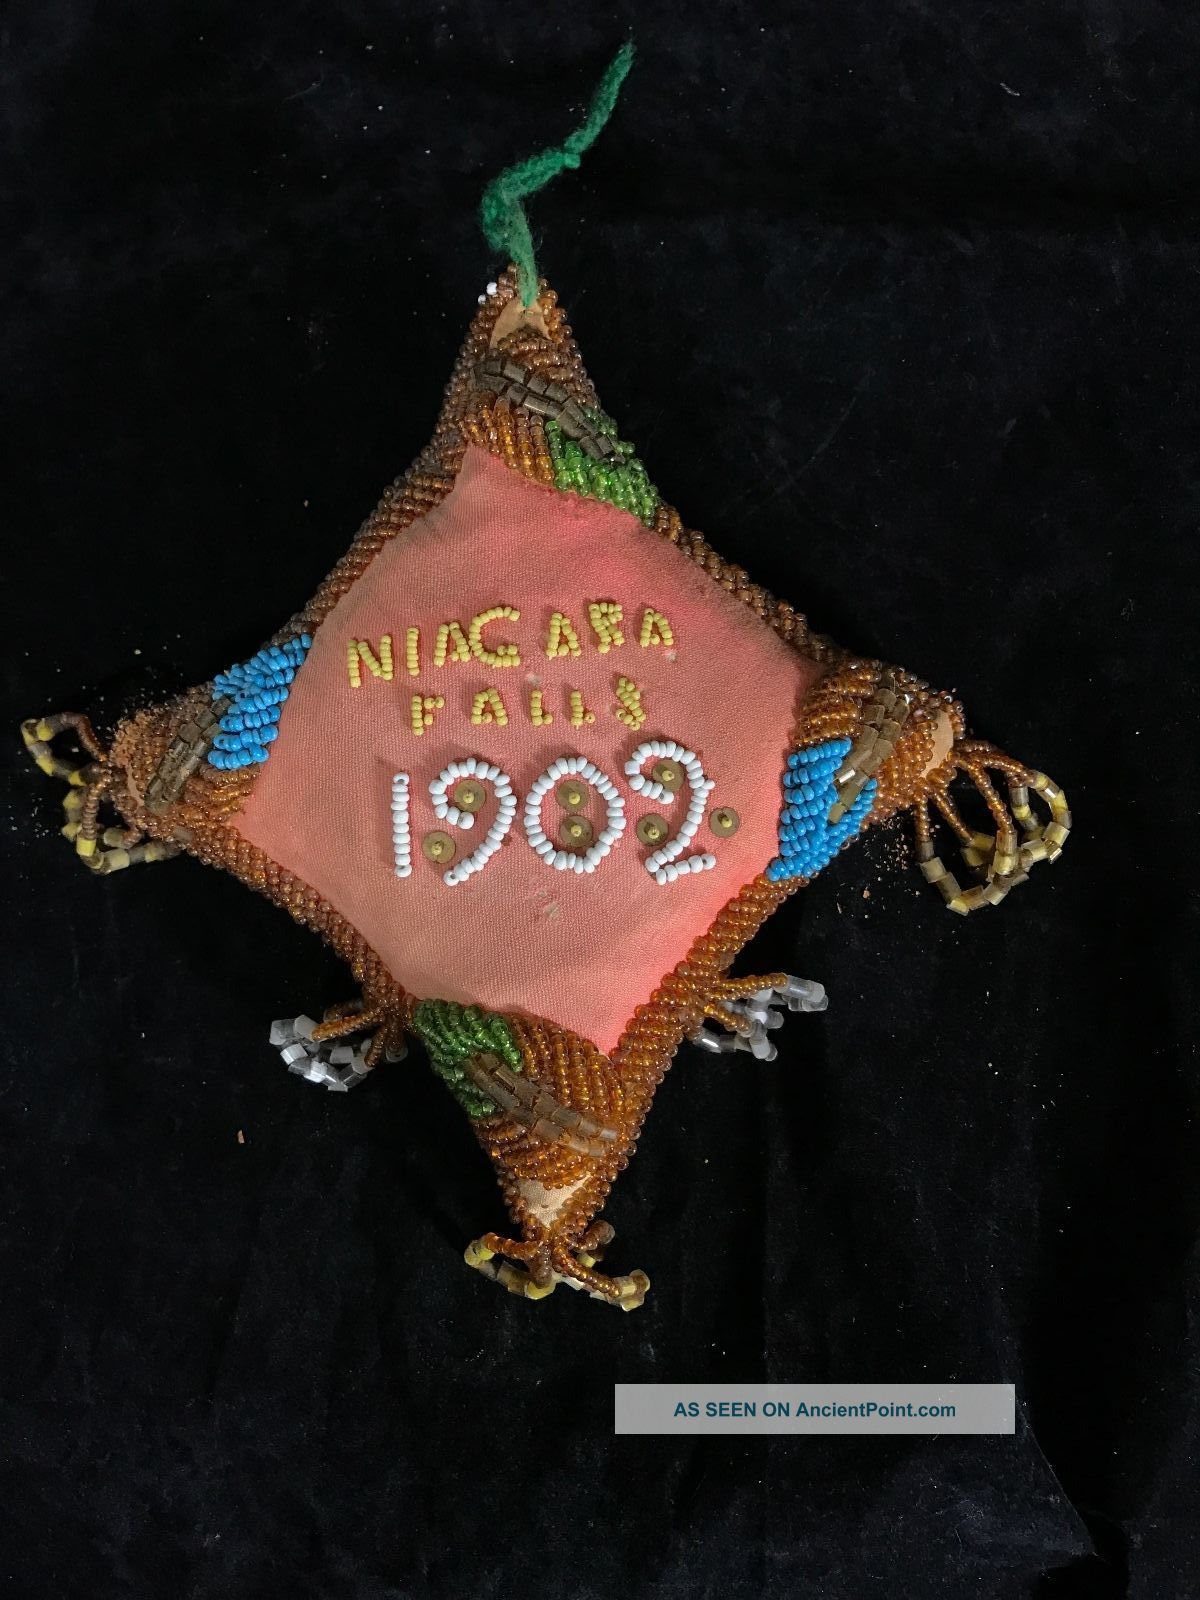 Iroquois Bead Work Pillow Pin Cushion Dated 1902 Native American Aafa Native American photo